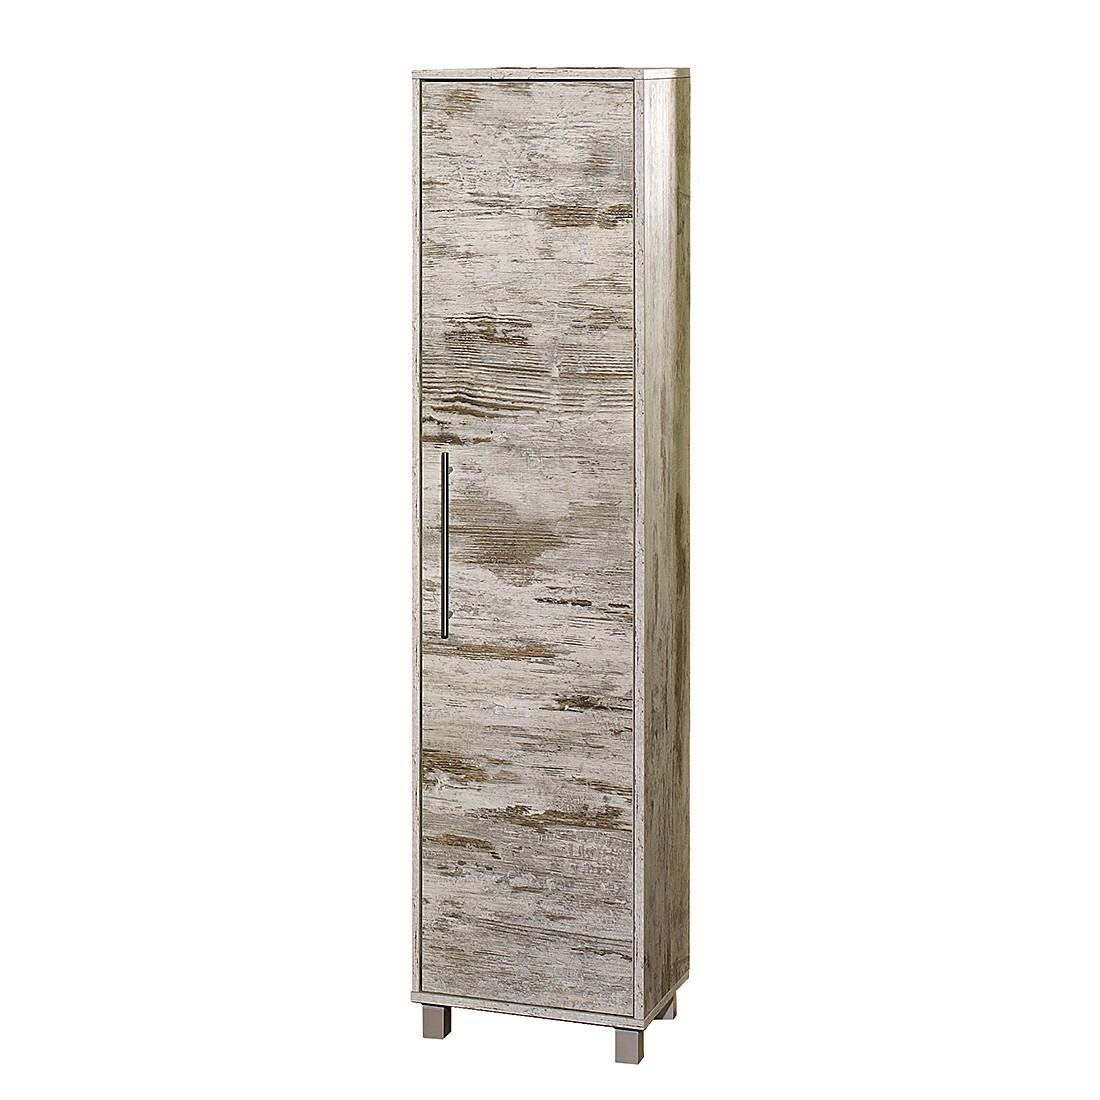 Badkamerkast Moncton   1 deur   antiek eiken_ Schildmeyer